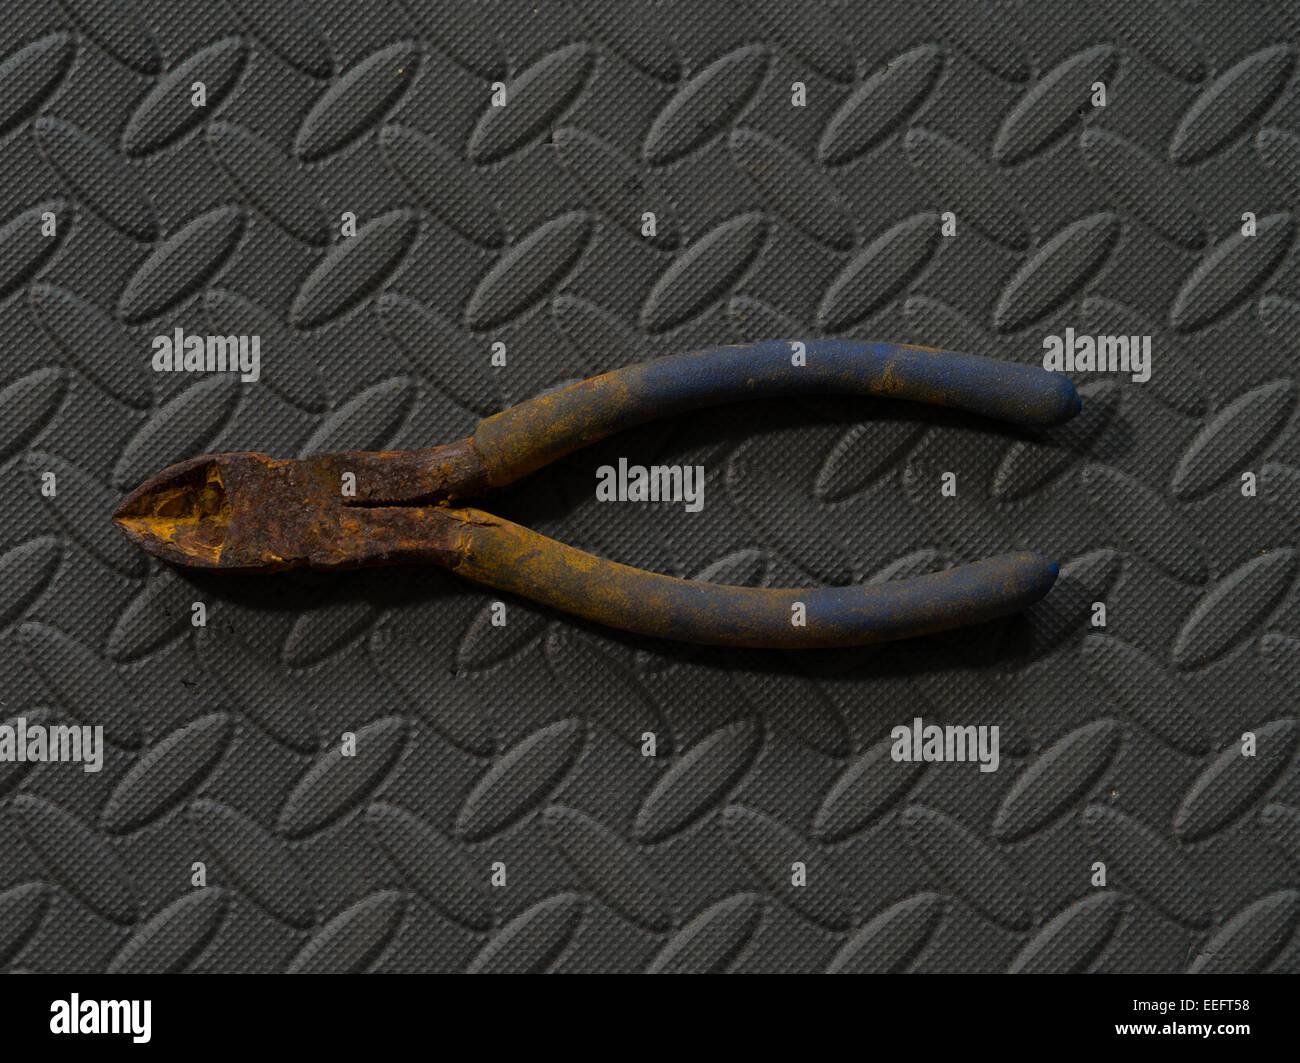 Wire cutters rusty Stock Photo: 77794900 - Alamy